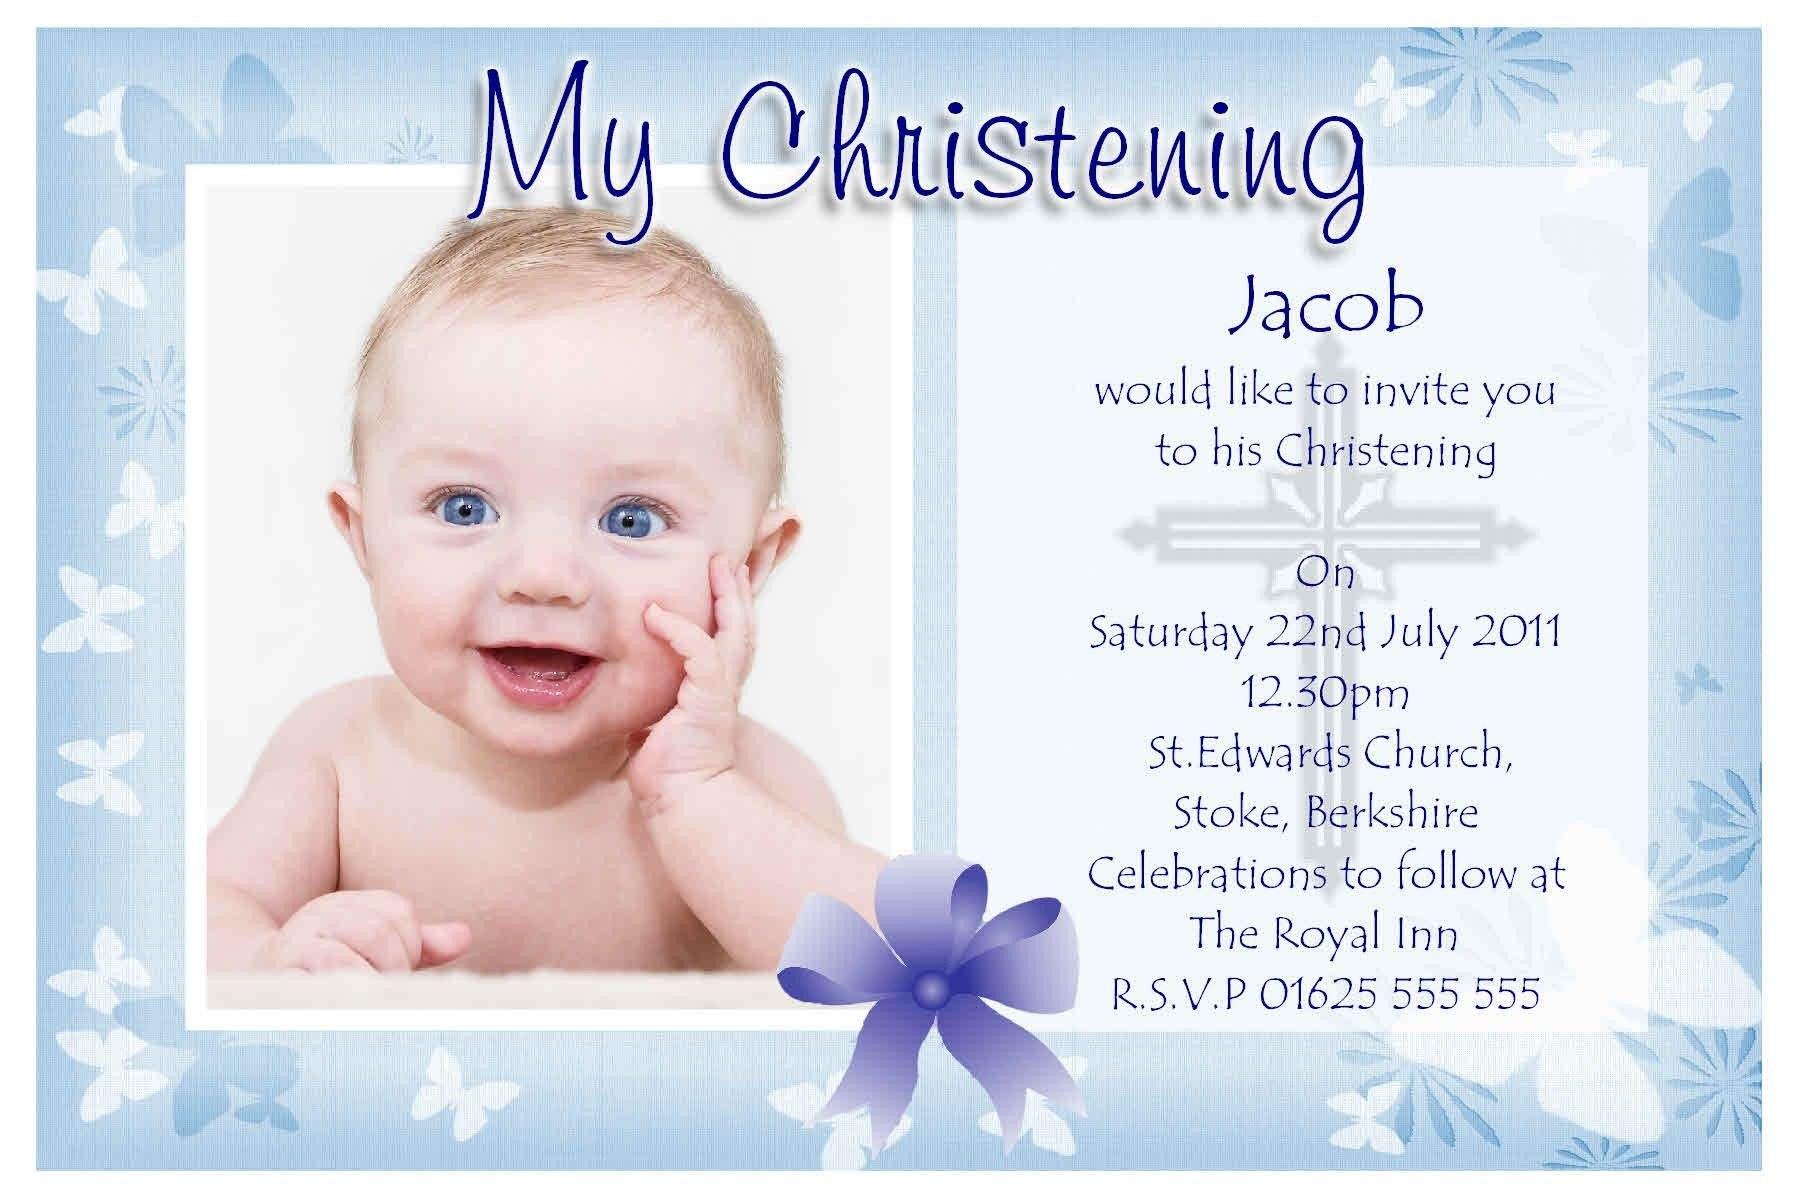 Free Christening Invitation Templates  Baptism Invitations Throughout Free Christening Invitation Cards Templates